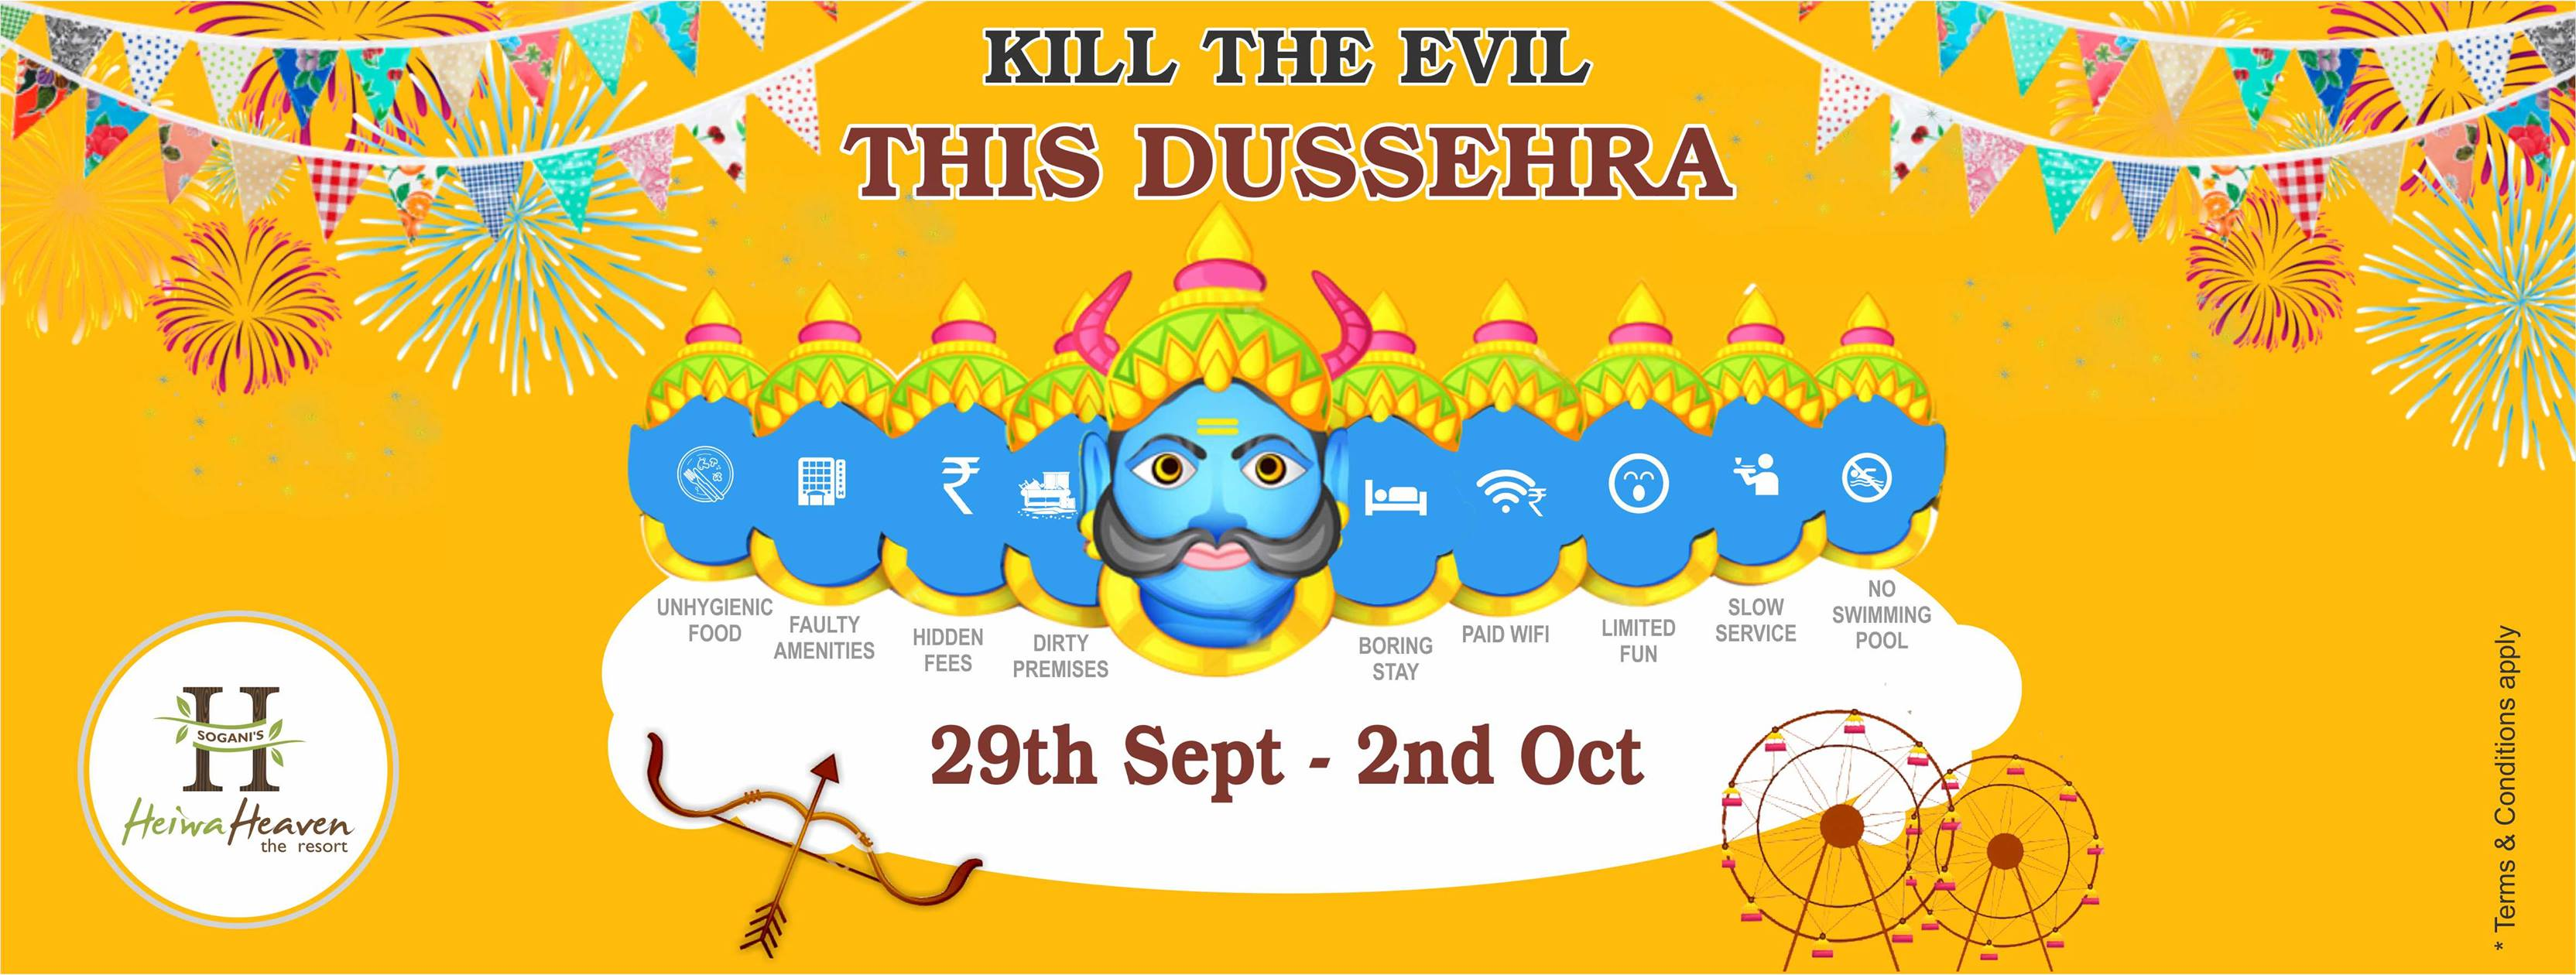 Dussehra in Jaipur